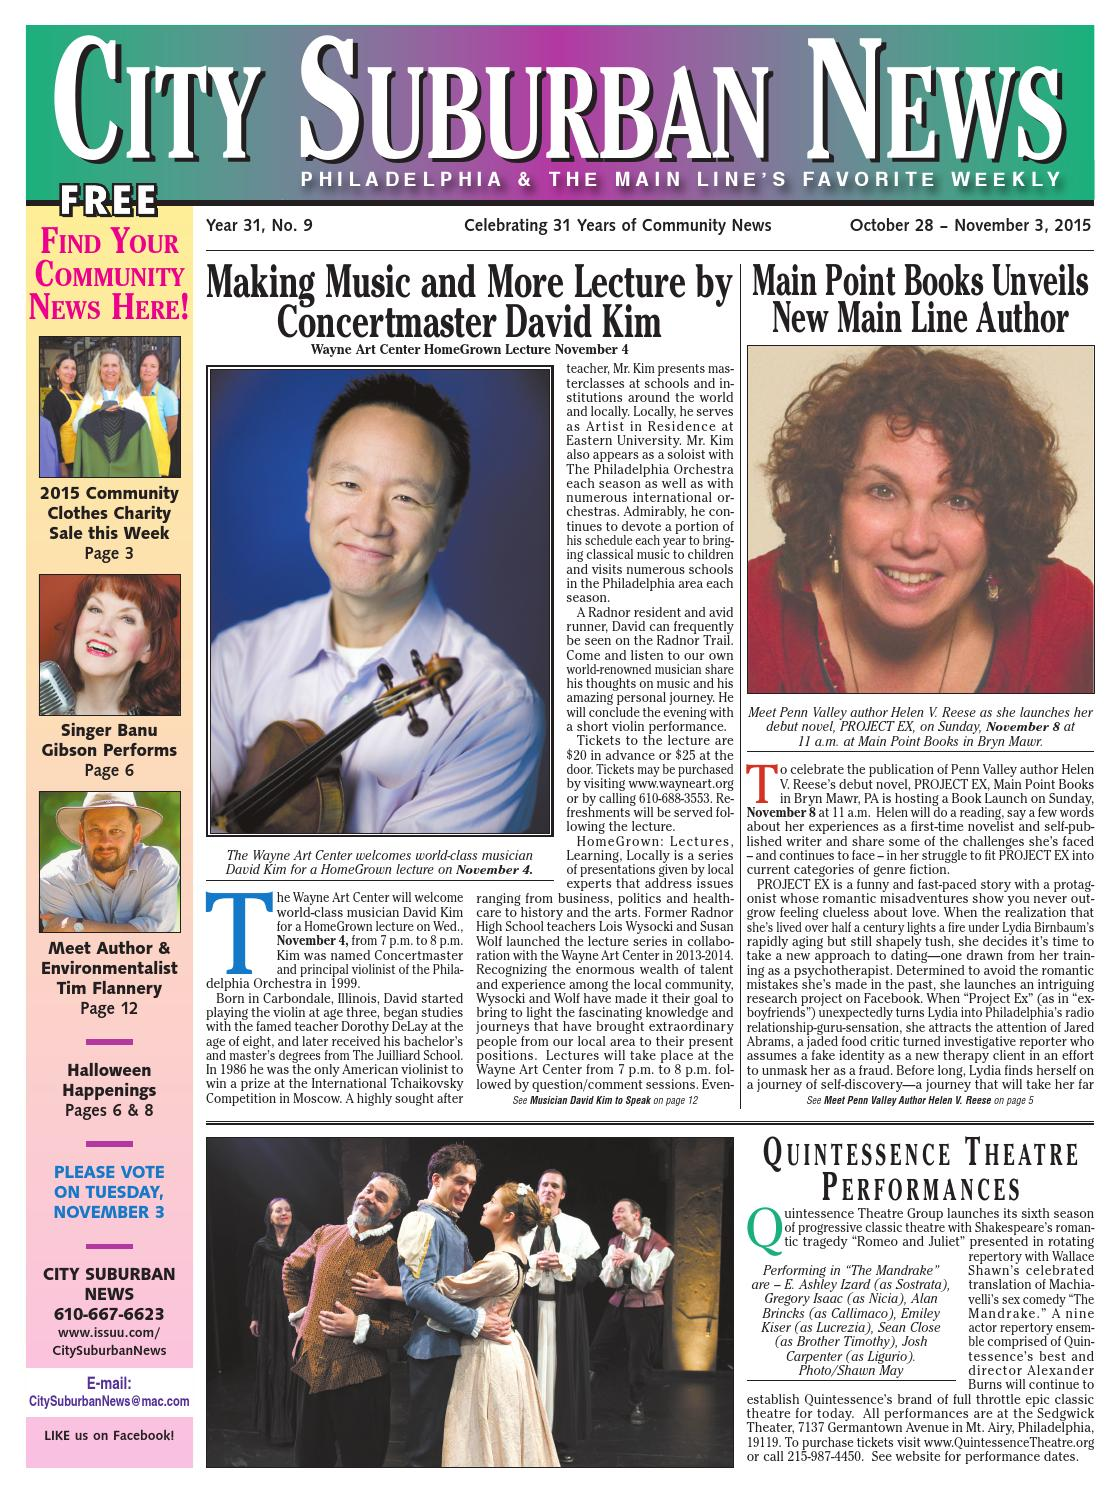 City Suburban News 10_28_15 issue by City Suburban News - issuu